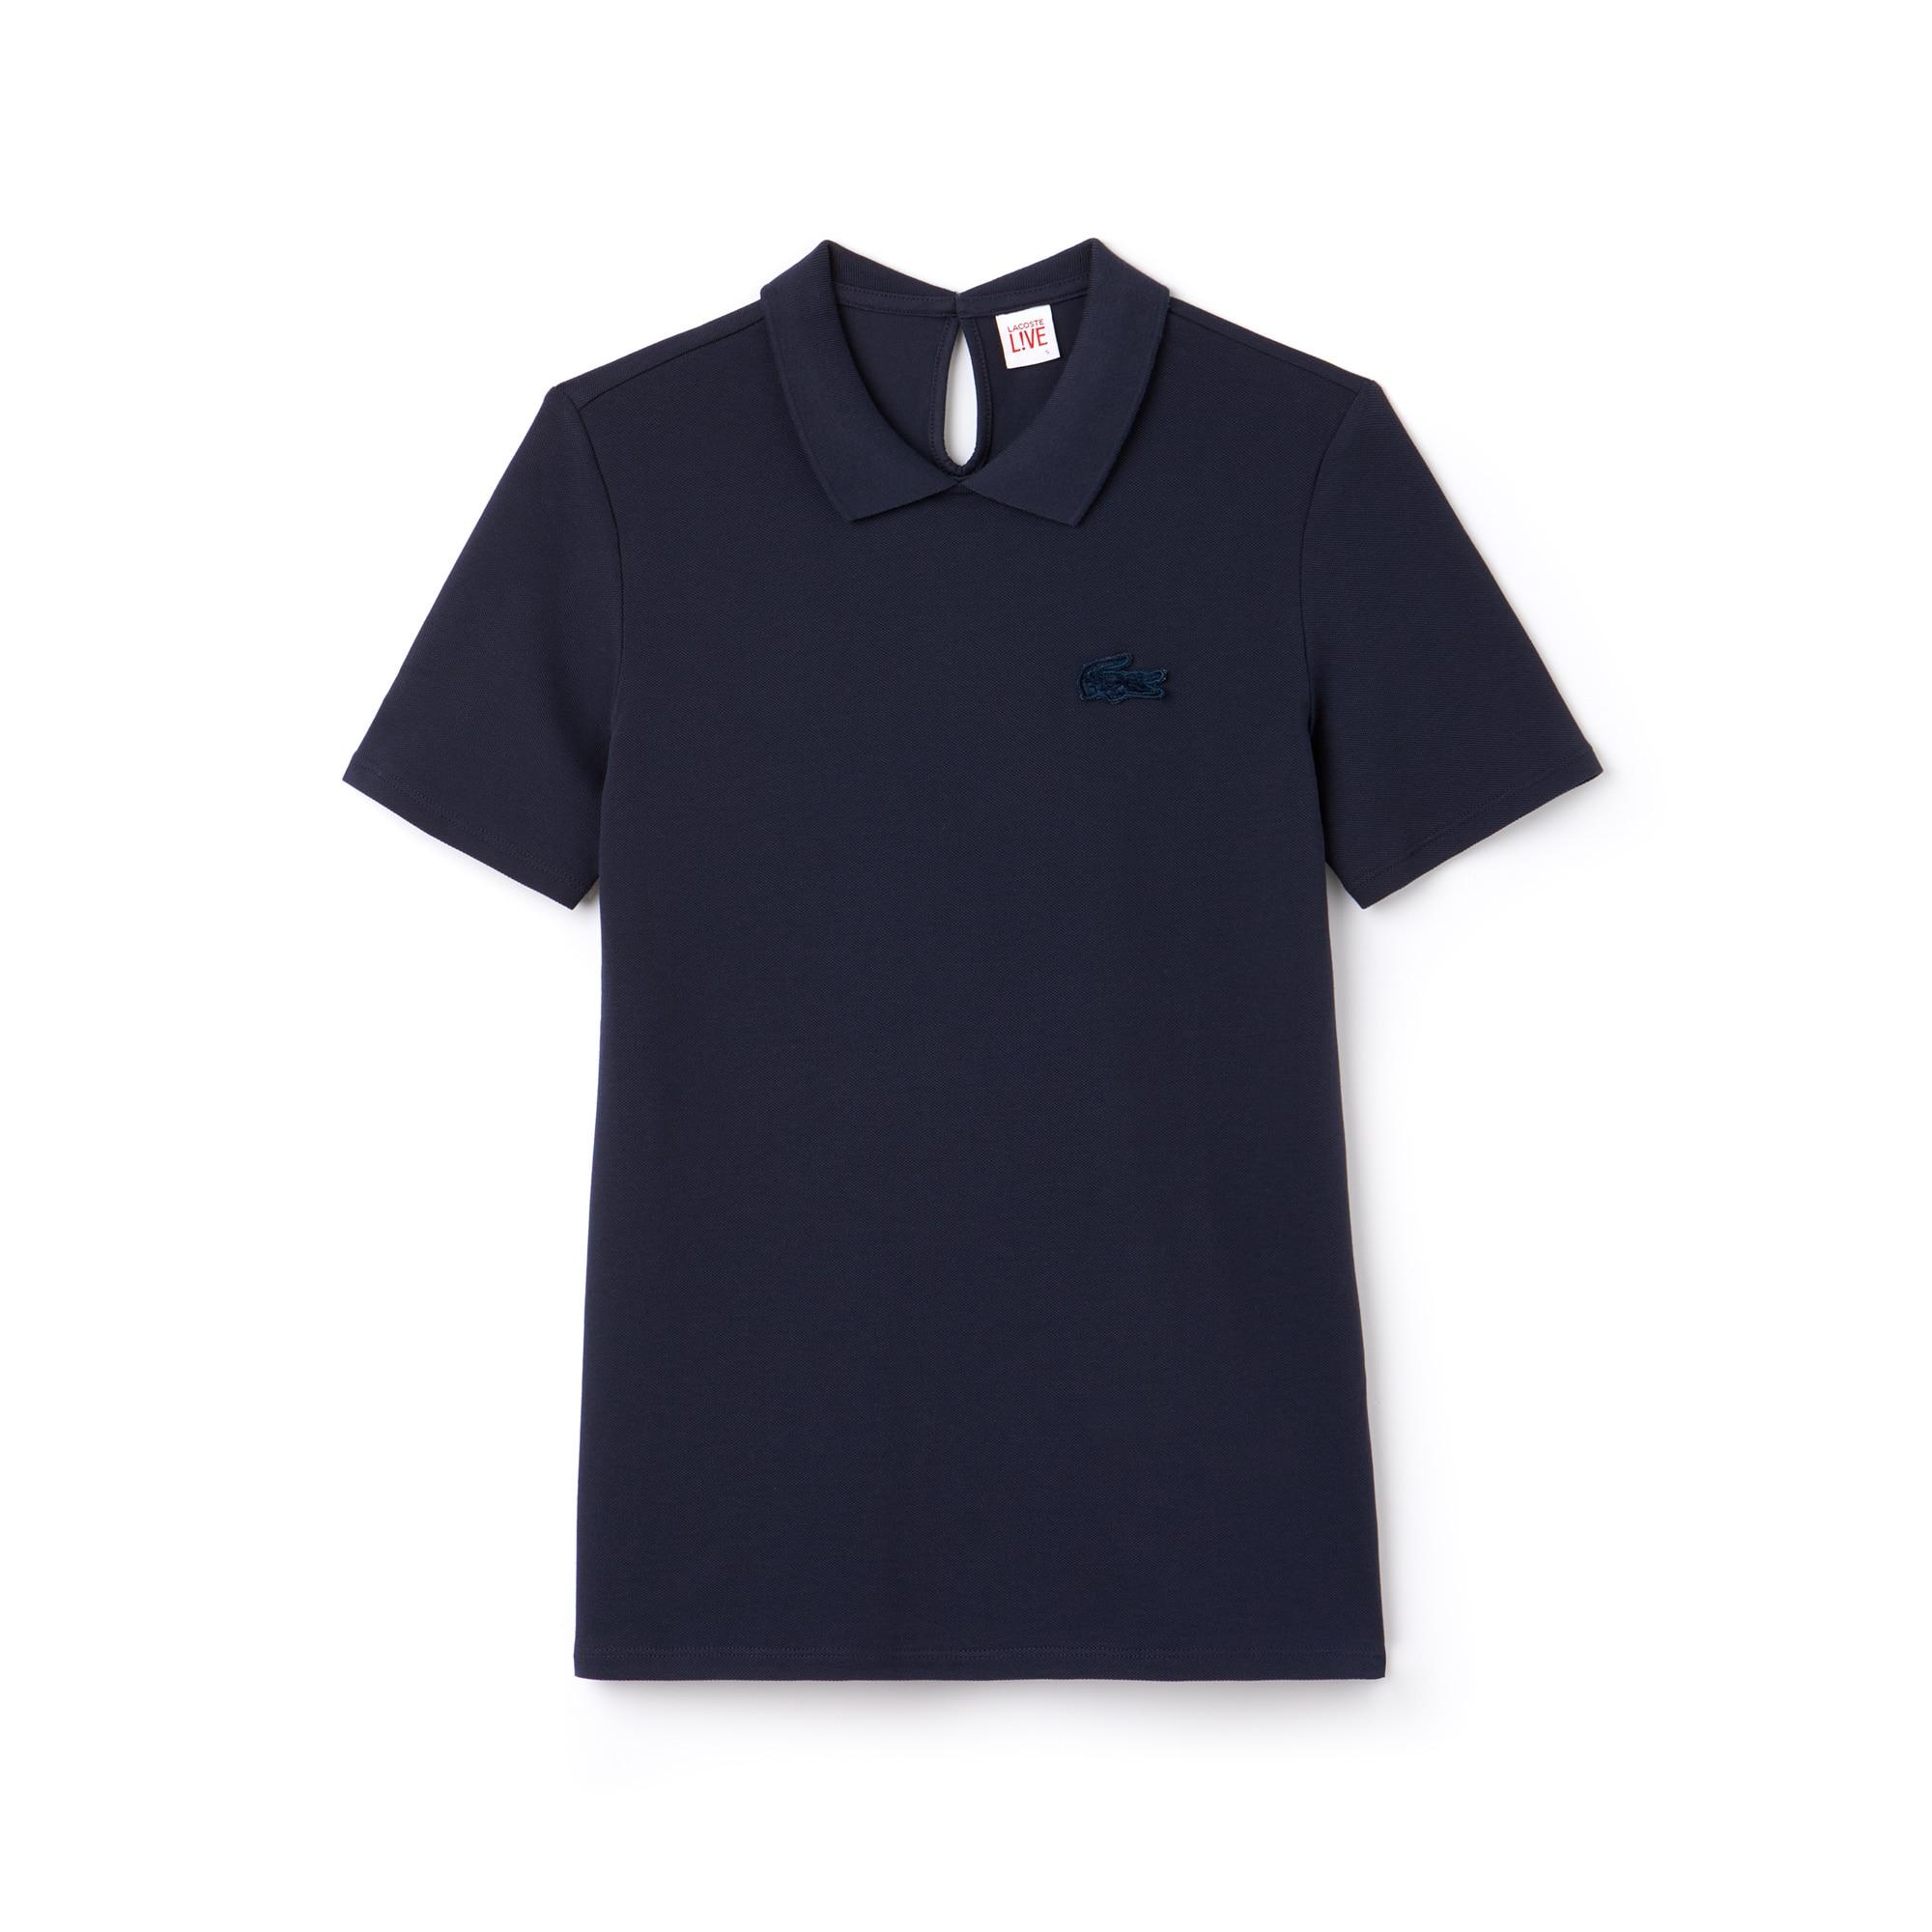 Women's Lacoste LIVE Teardrop Opening Mini Piqué Polo Shirt